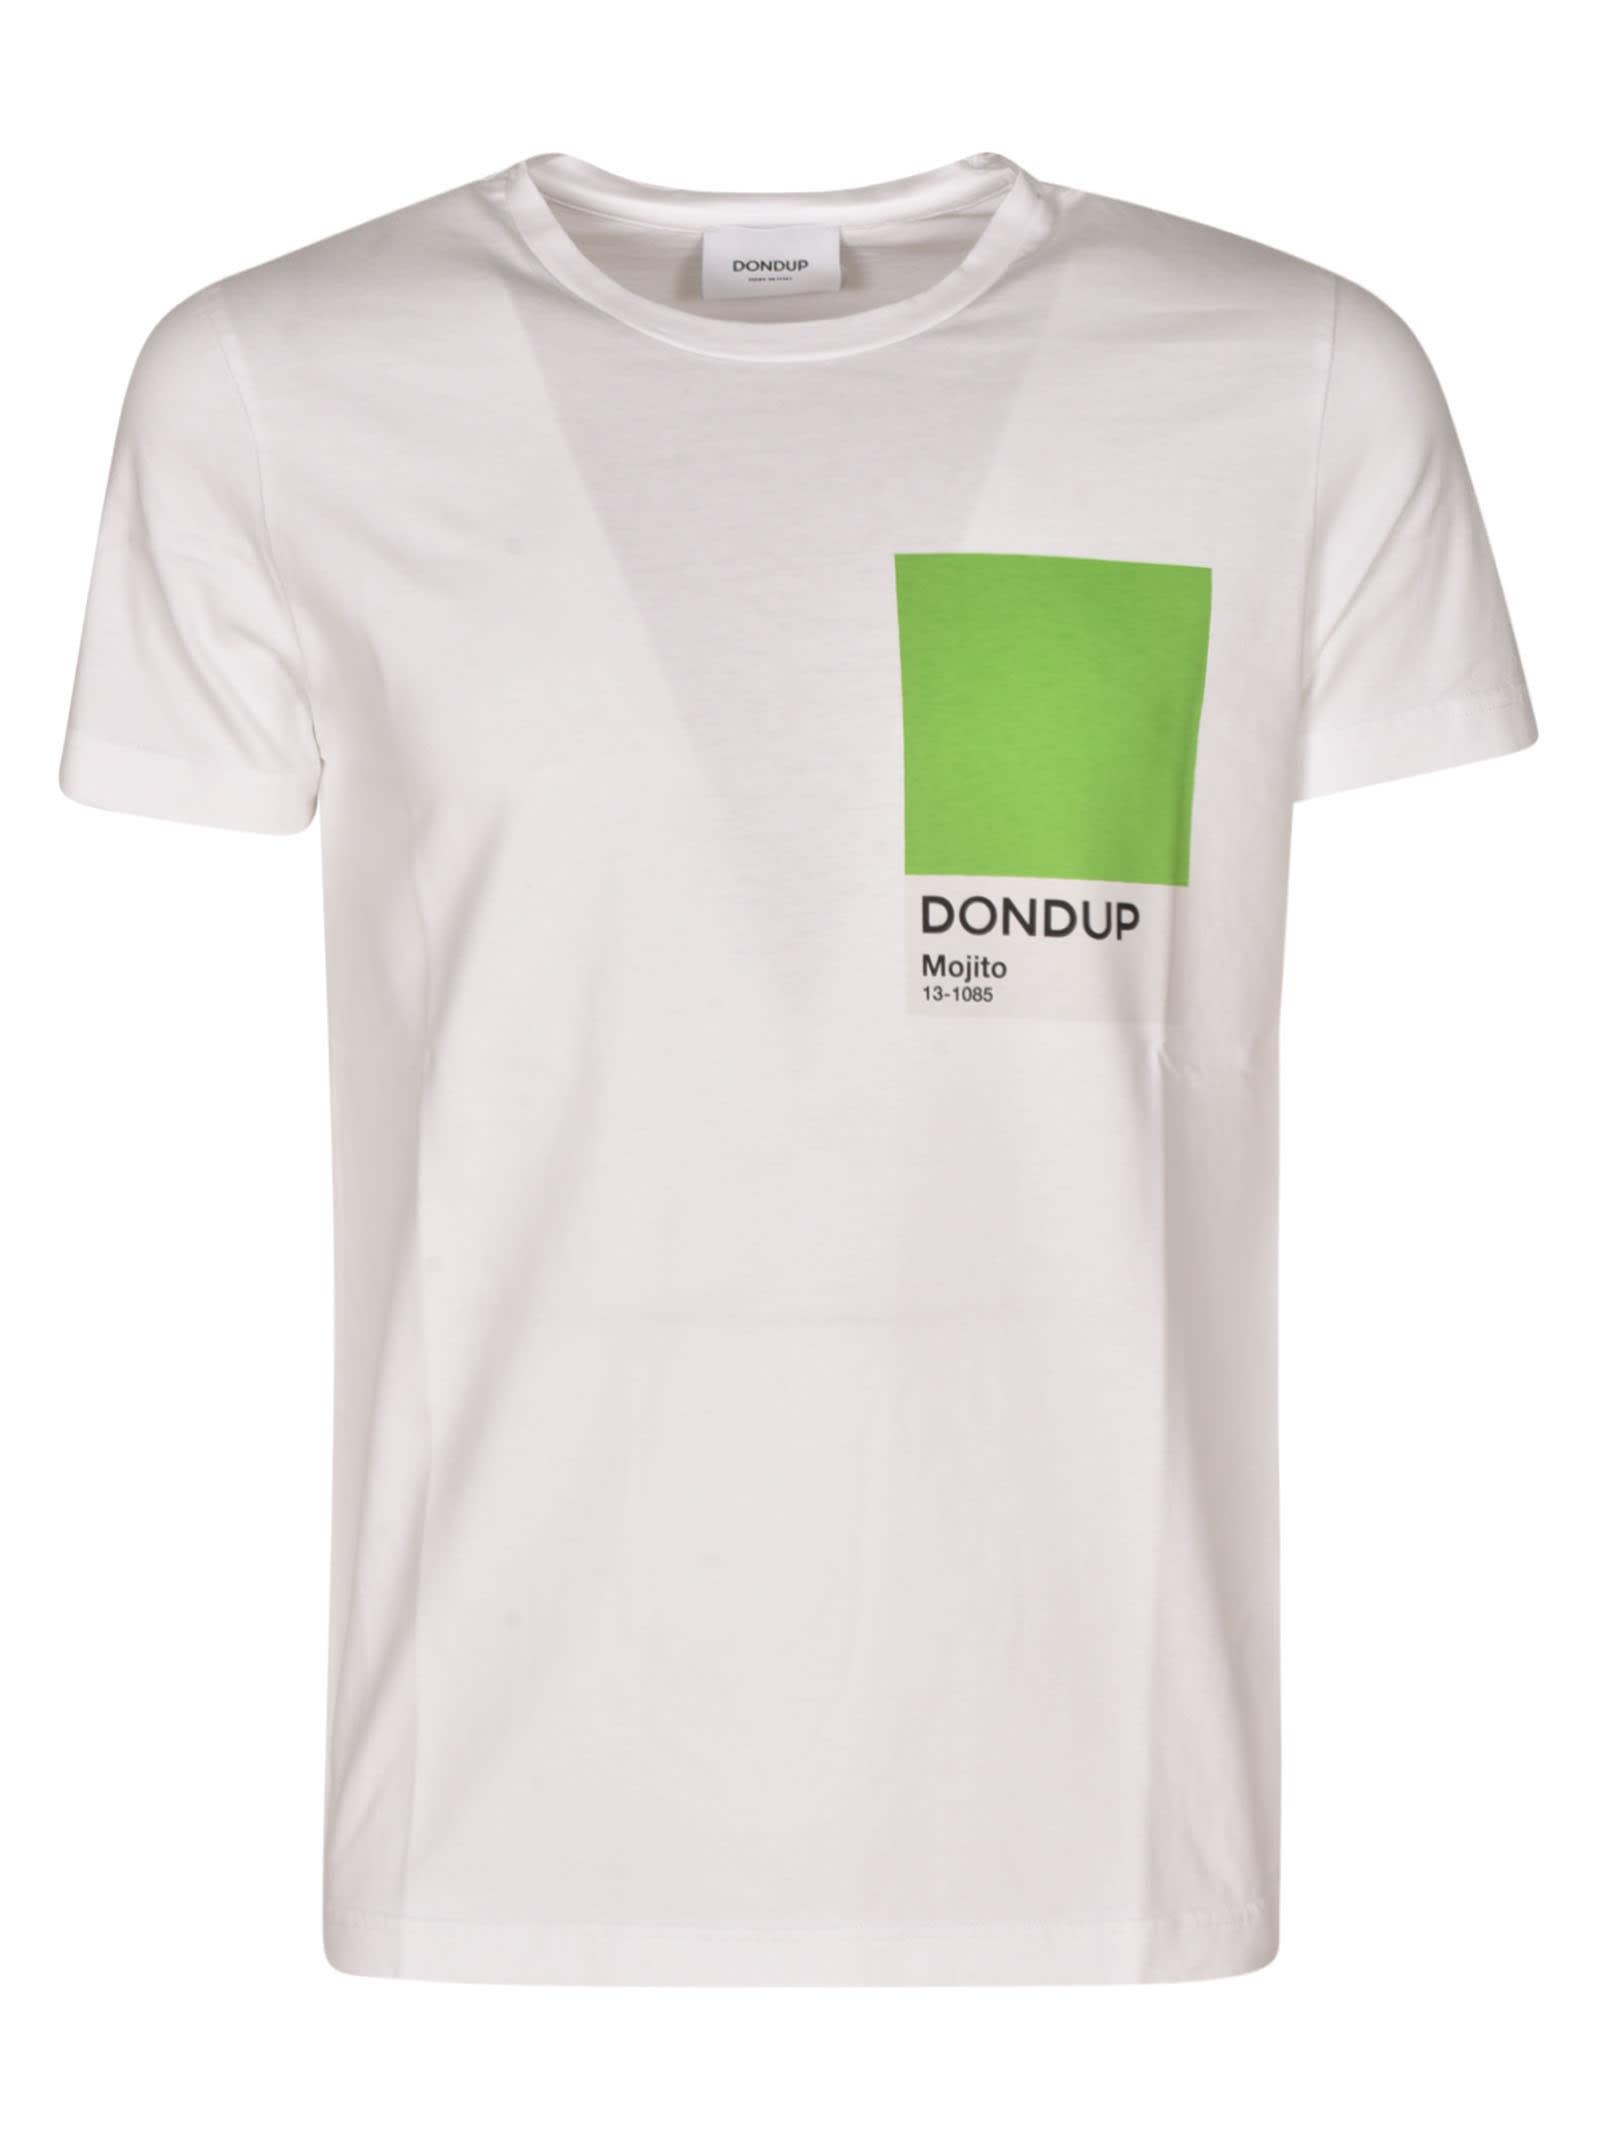 Dondup Clothing LOGO PRINT T-SHIRT